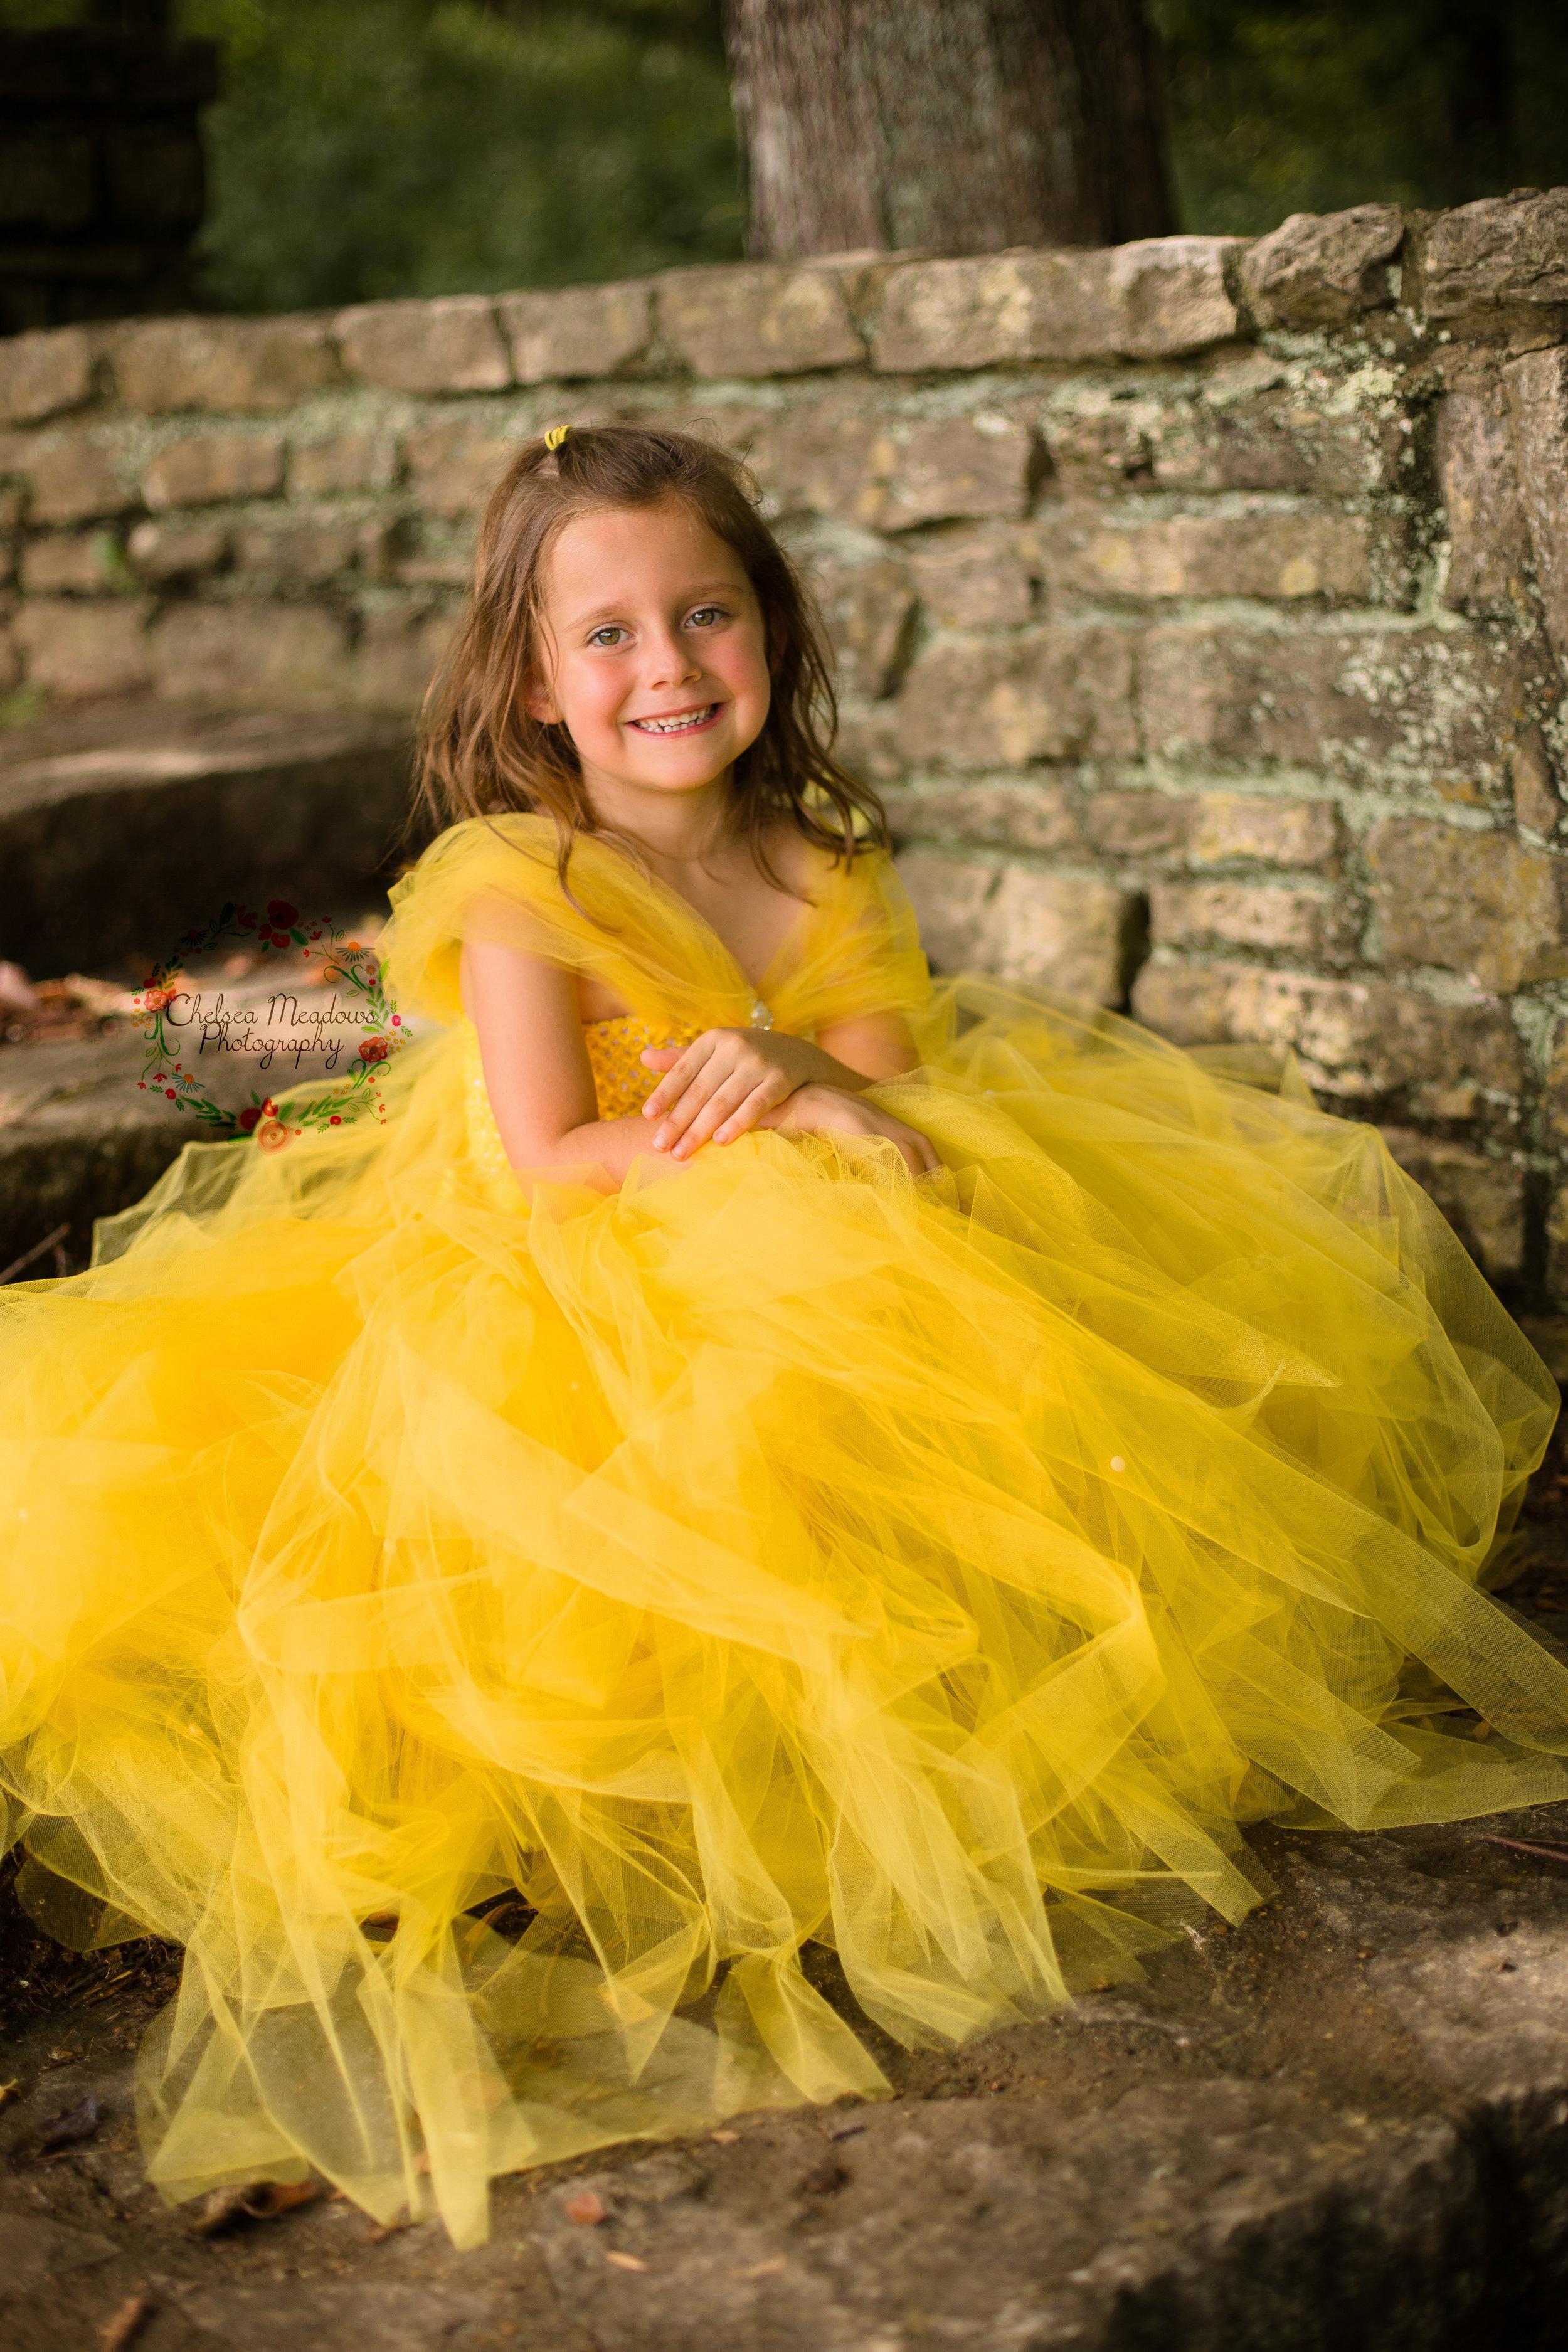 April 6th Birthday - Nashville Family Photographer - Chelsea Meadows Photography (46).jpg